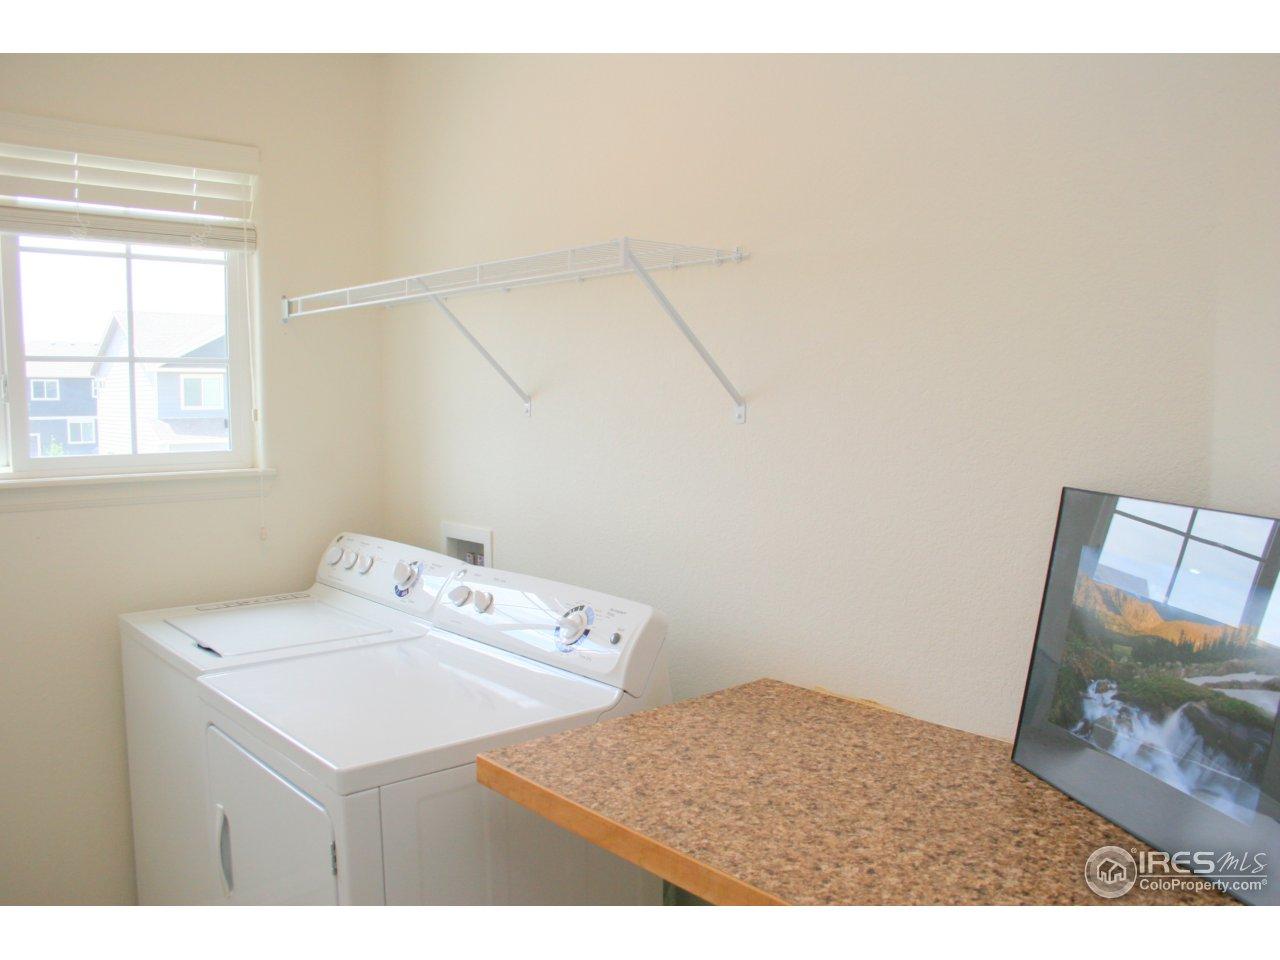 2nd Level Laundry Room